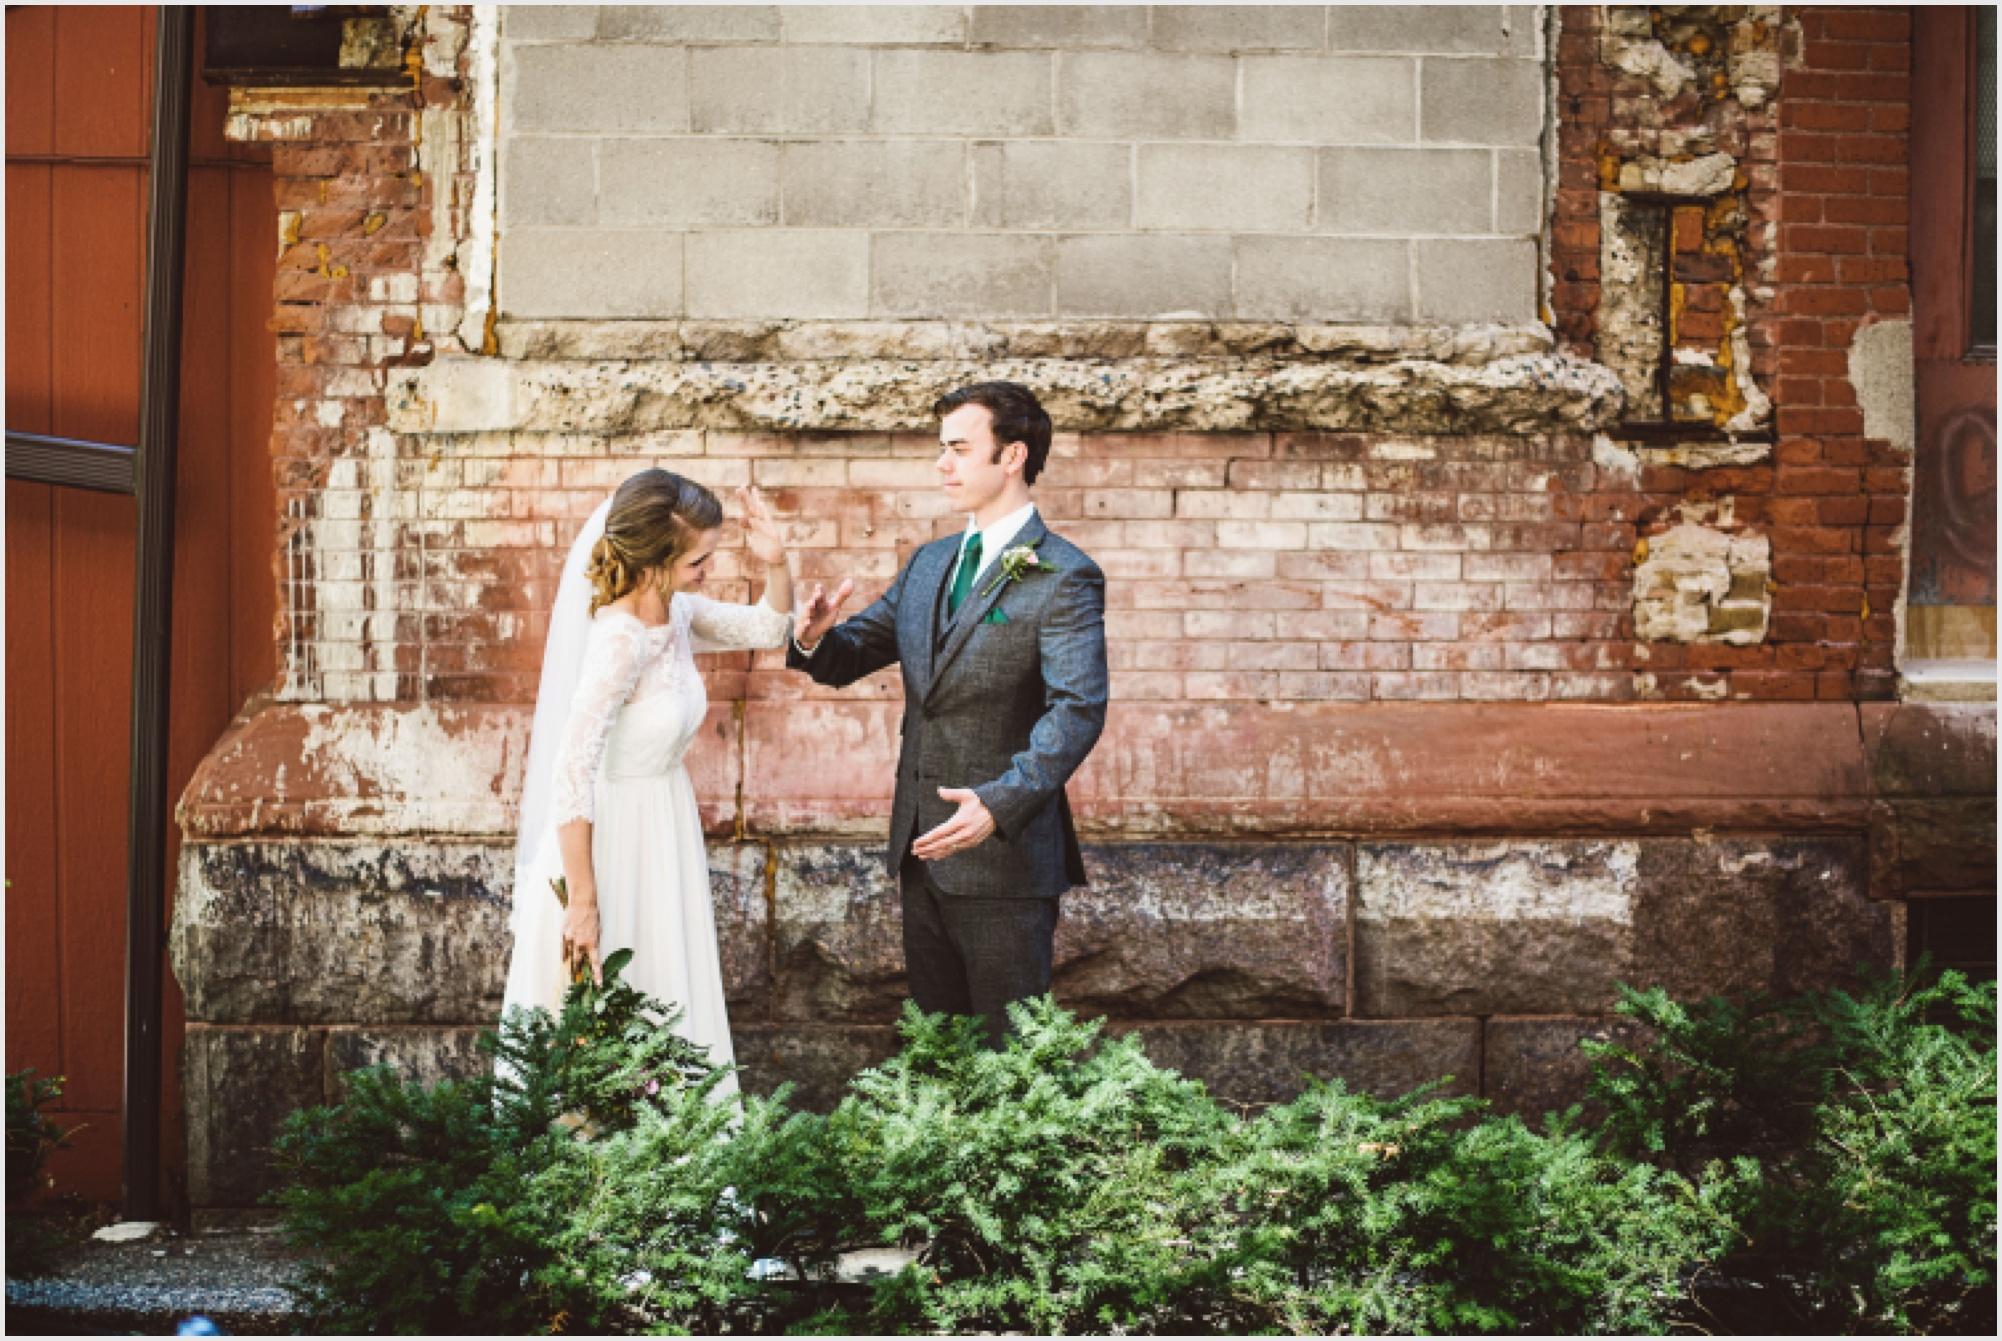 abby_taylor_minneapolis_wedding_lucas_botz_photography_155.jpg